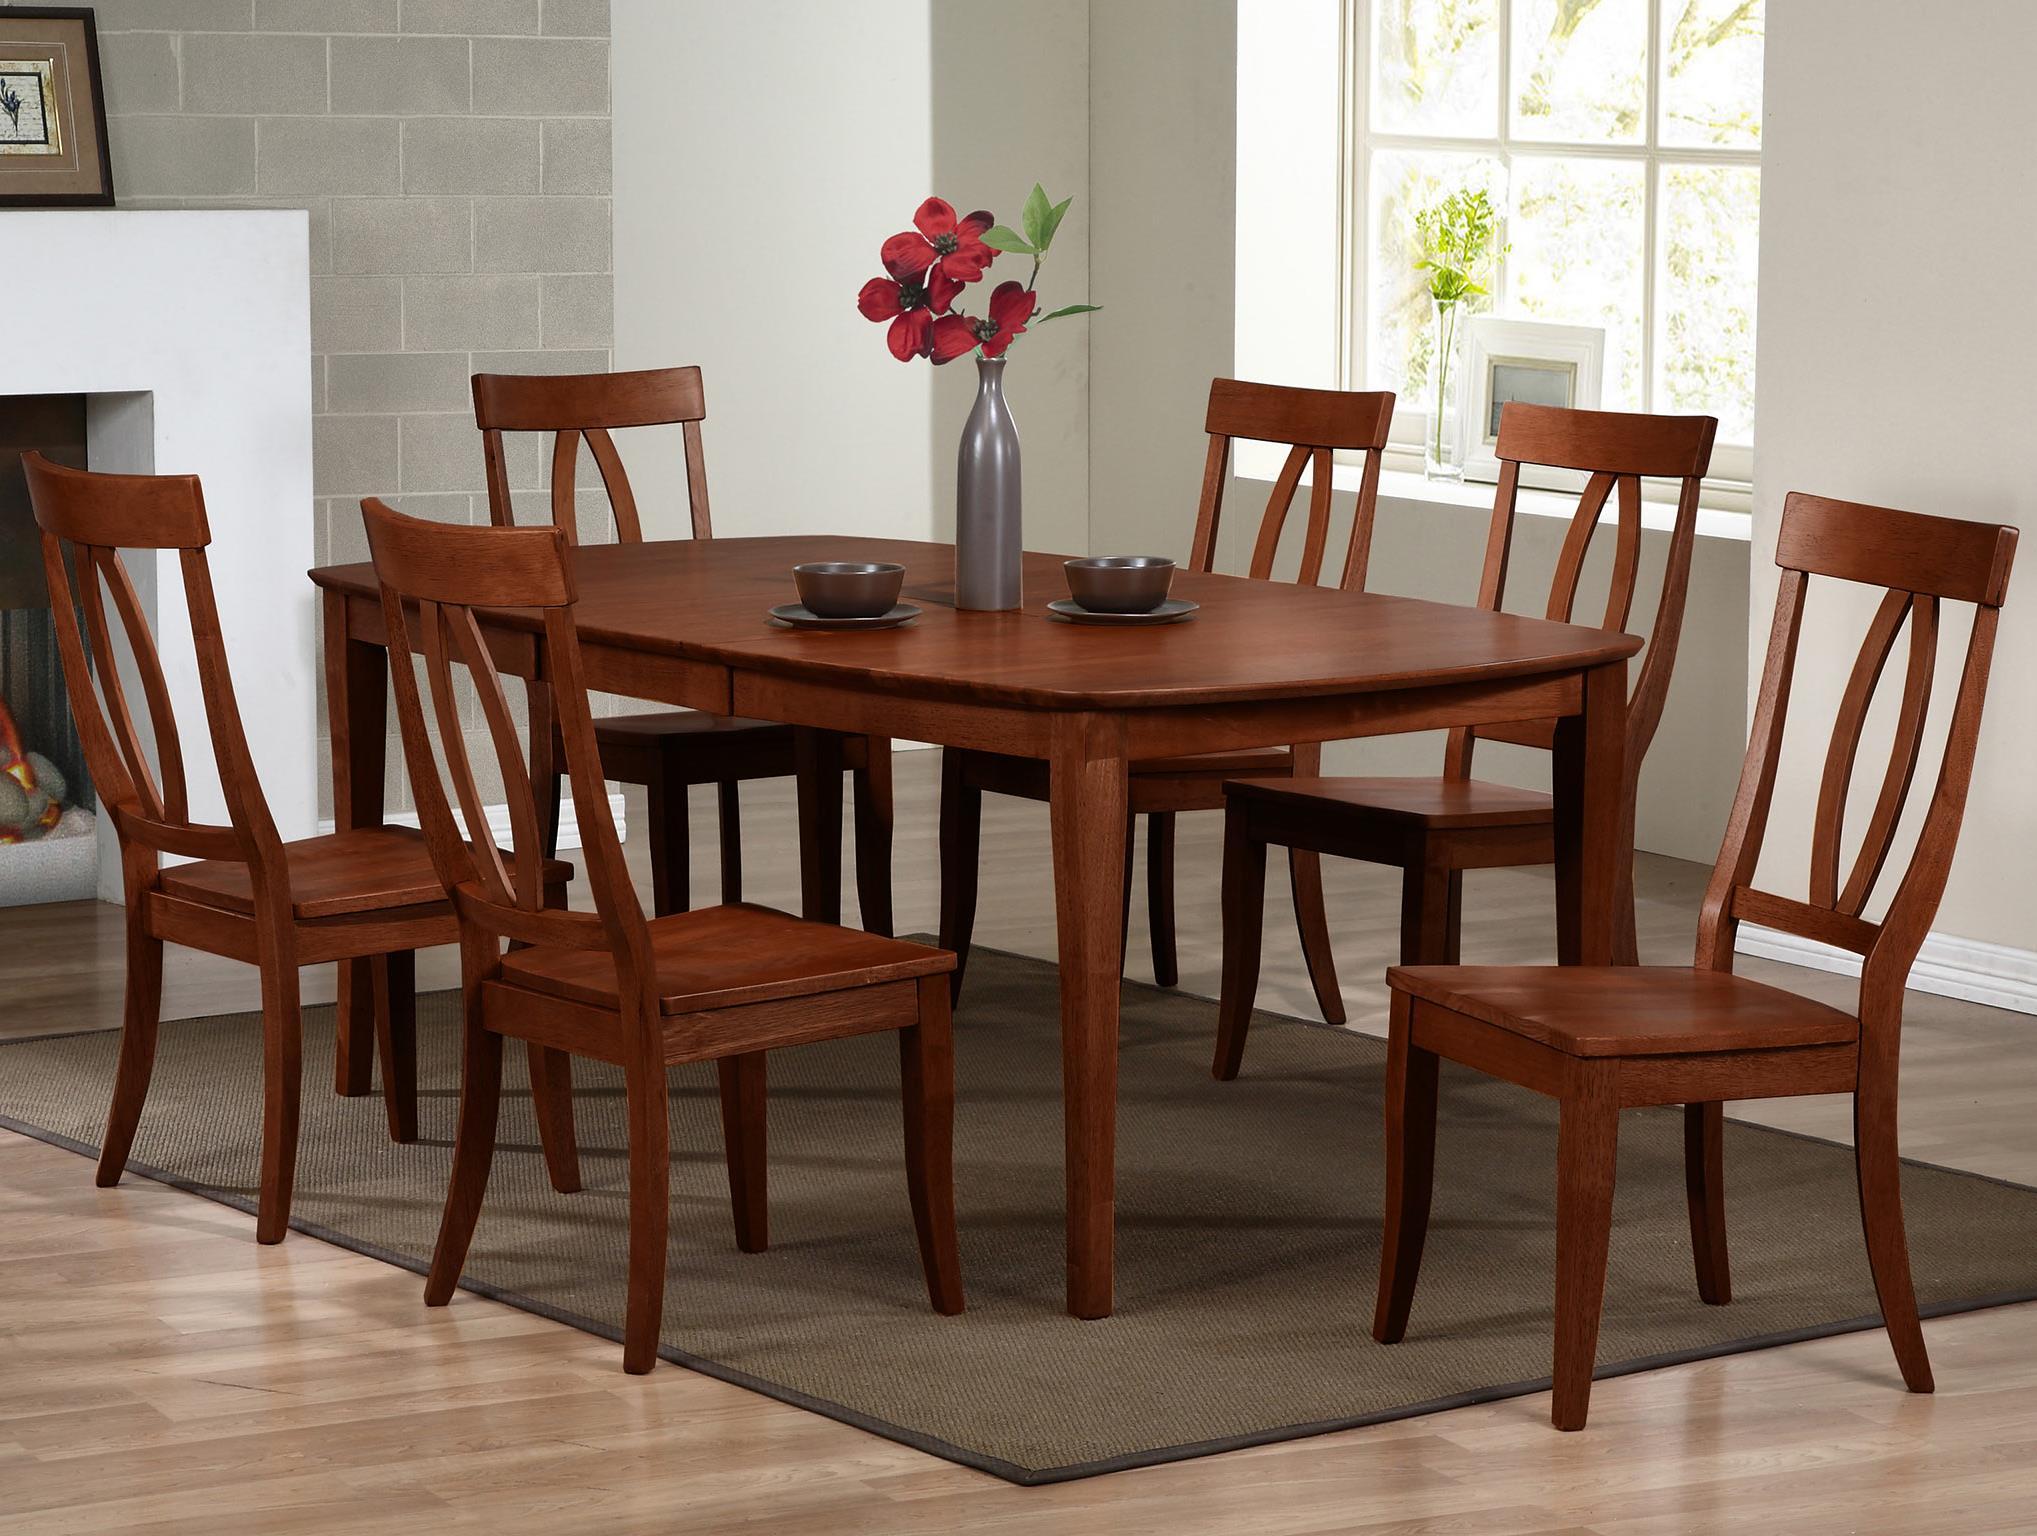 Santa Barbara SBF 7 Piece Dining Set With Keyhole Back Chairs